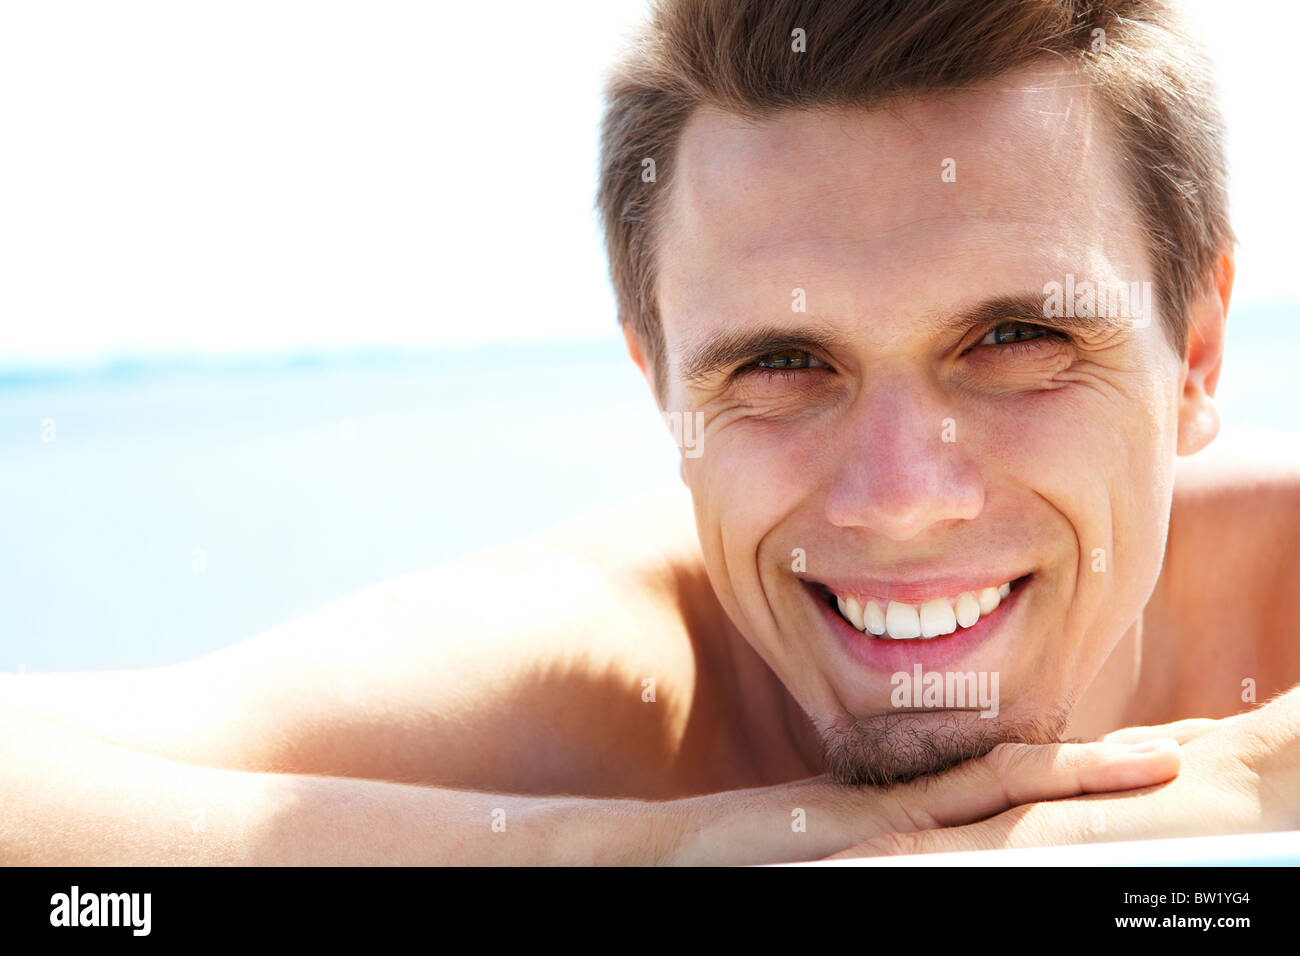 Photo of smiling guy looking at camera while sunbathing - Stock Image